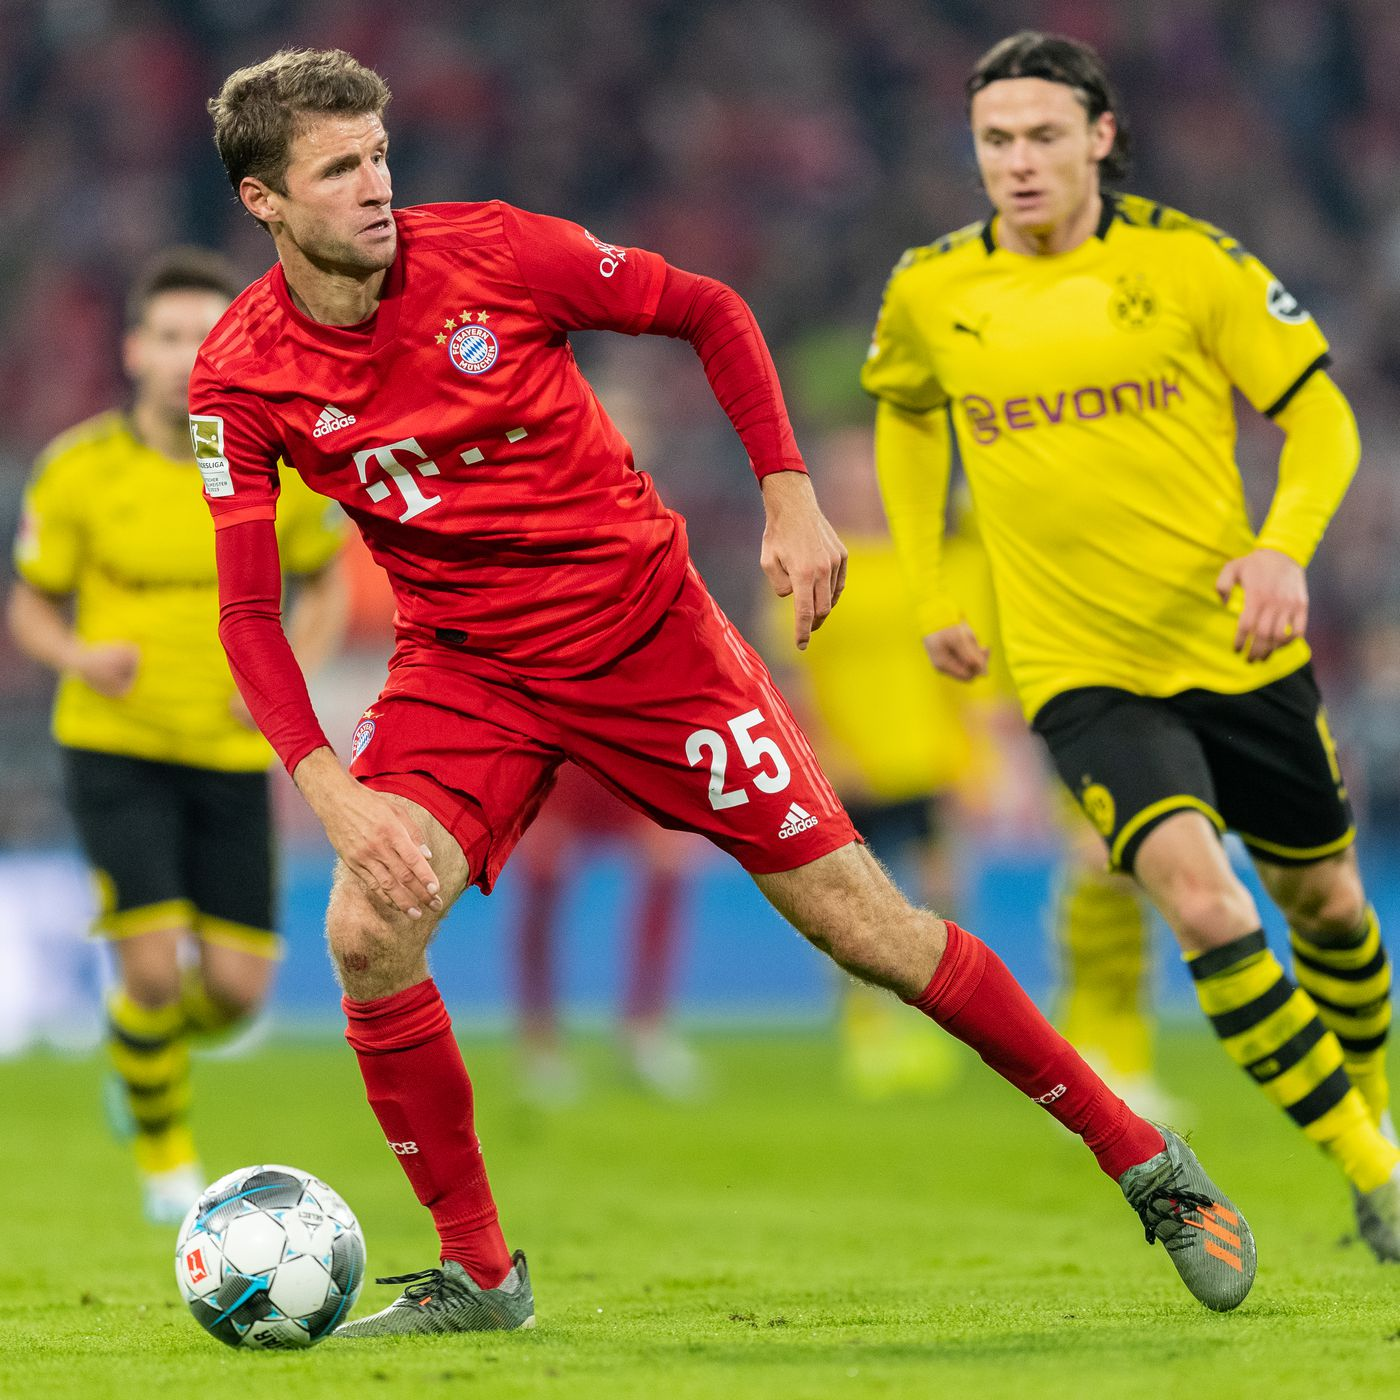 Dortmund vs Bayern Munich HD wallpaper